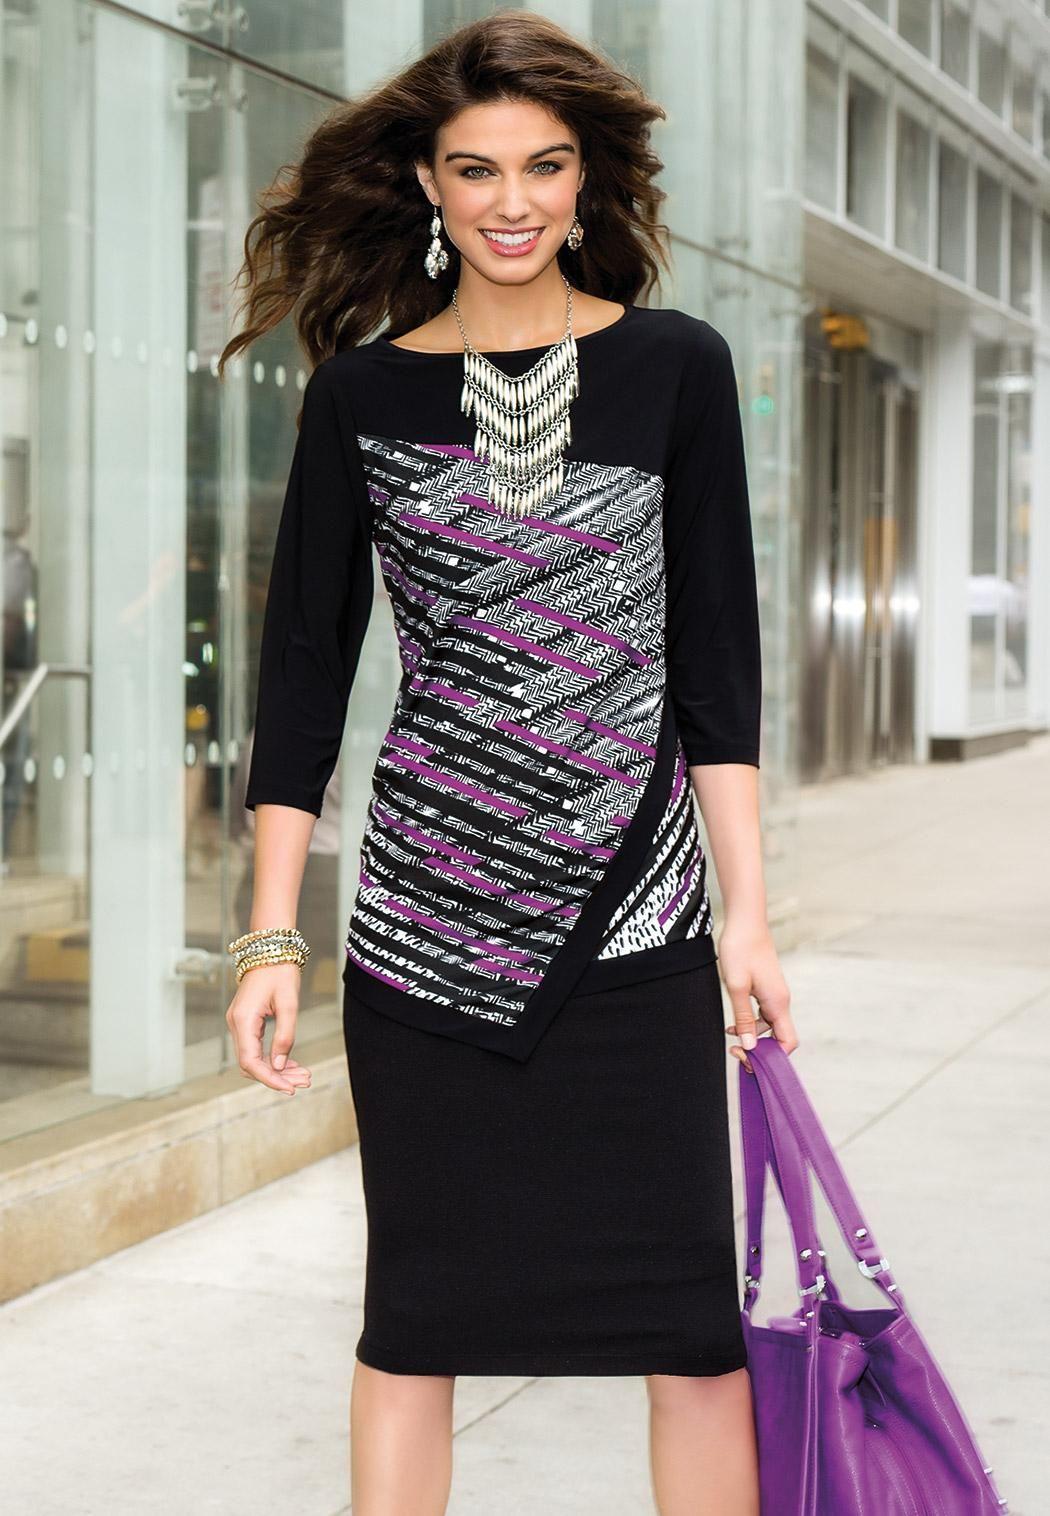 Cato Fashions Cato fashion, Fashion, Nice dresses